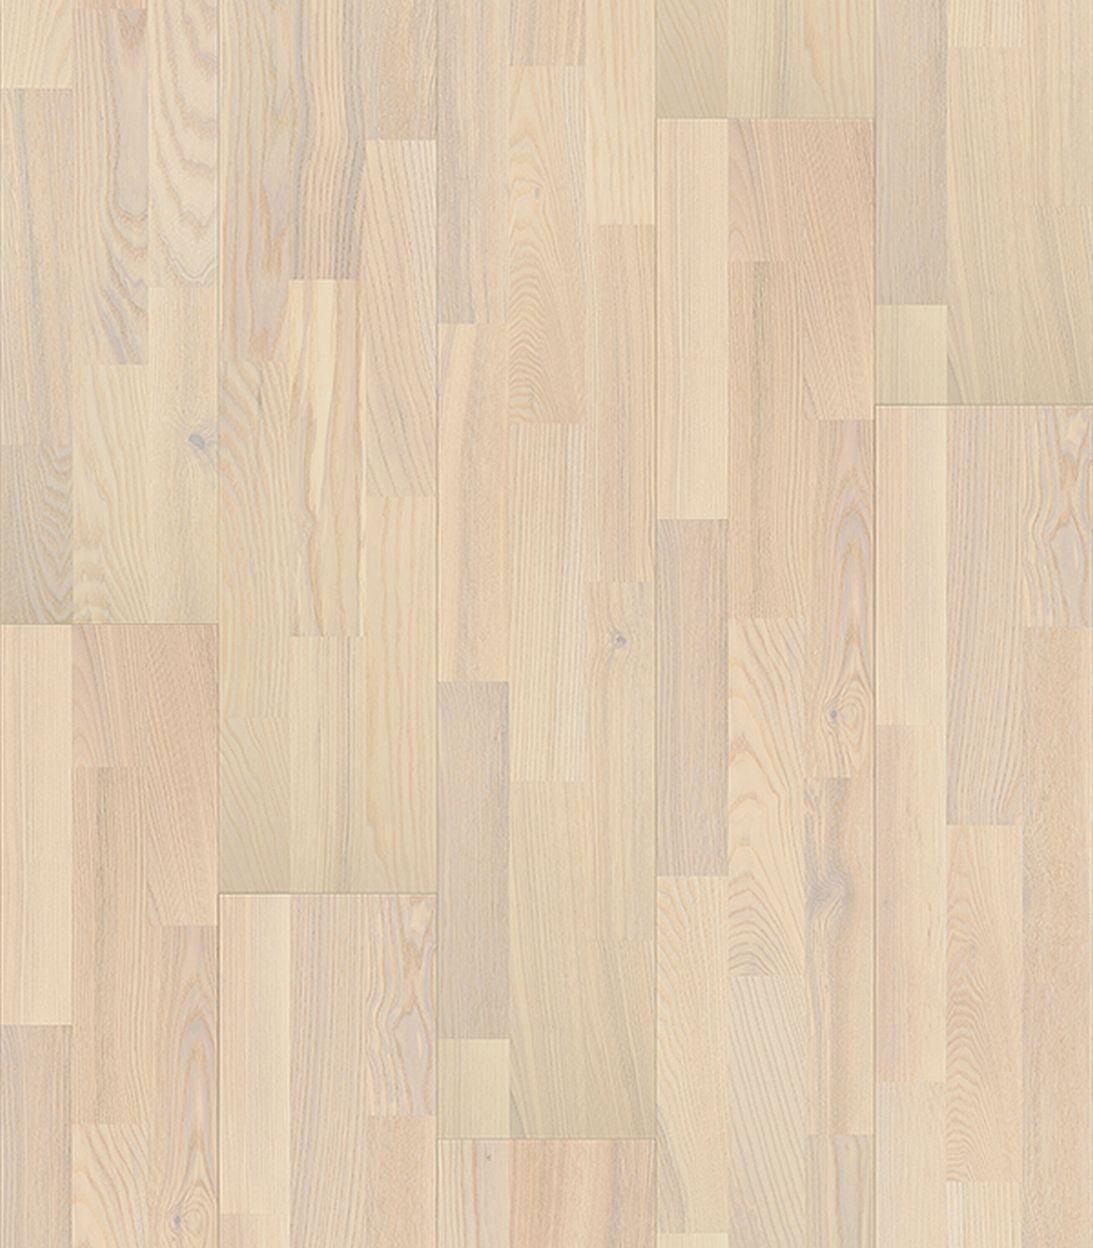 Паркетная доска BLANCO ясень тренд 3П белый матовый лак 14мм паркетная доска haro однополосная 4000 series мербау 2200x180x13 5 мм